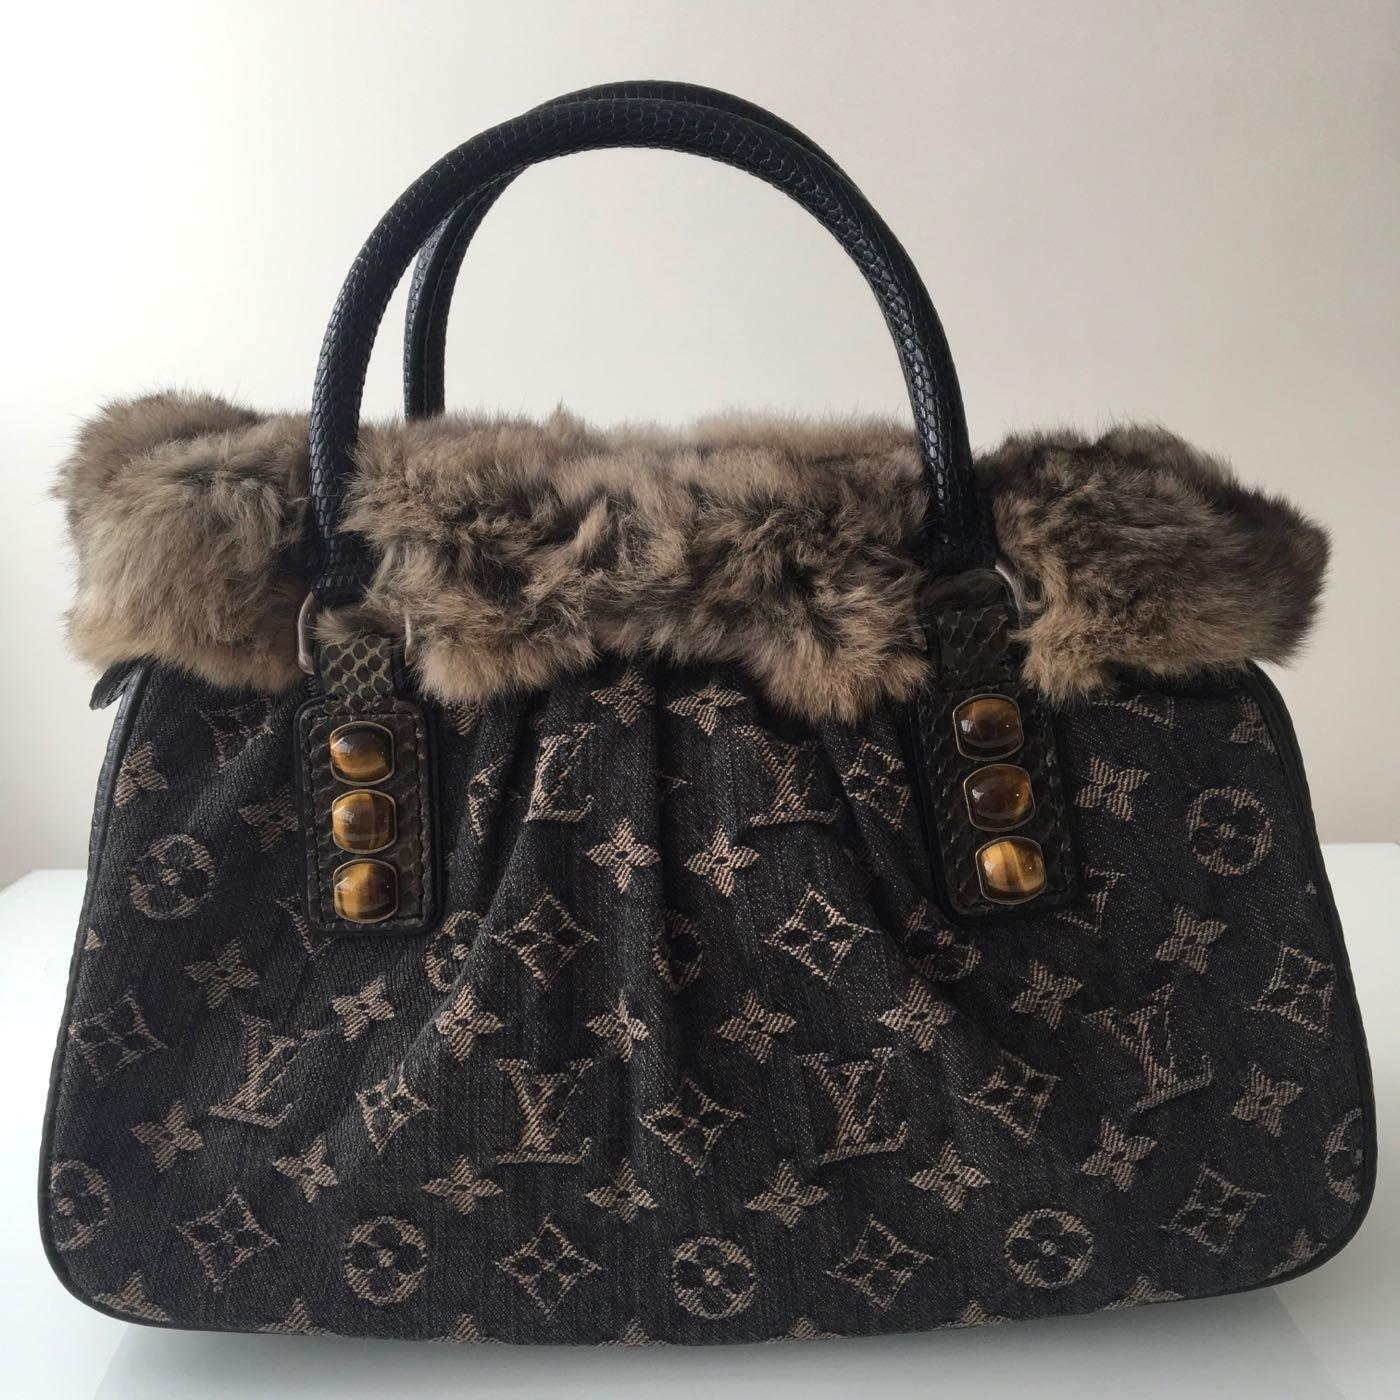 (^0^)/ ❤️Louis Vuitton 100%真品 蜥蜴皮🦎蛇皮🐍金吉拉毛🐱牛仔布限量秀包《9.5成新》新年走春特選商品❤️